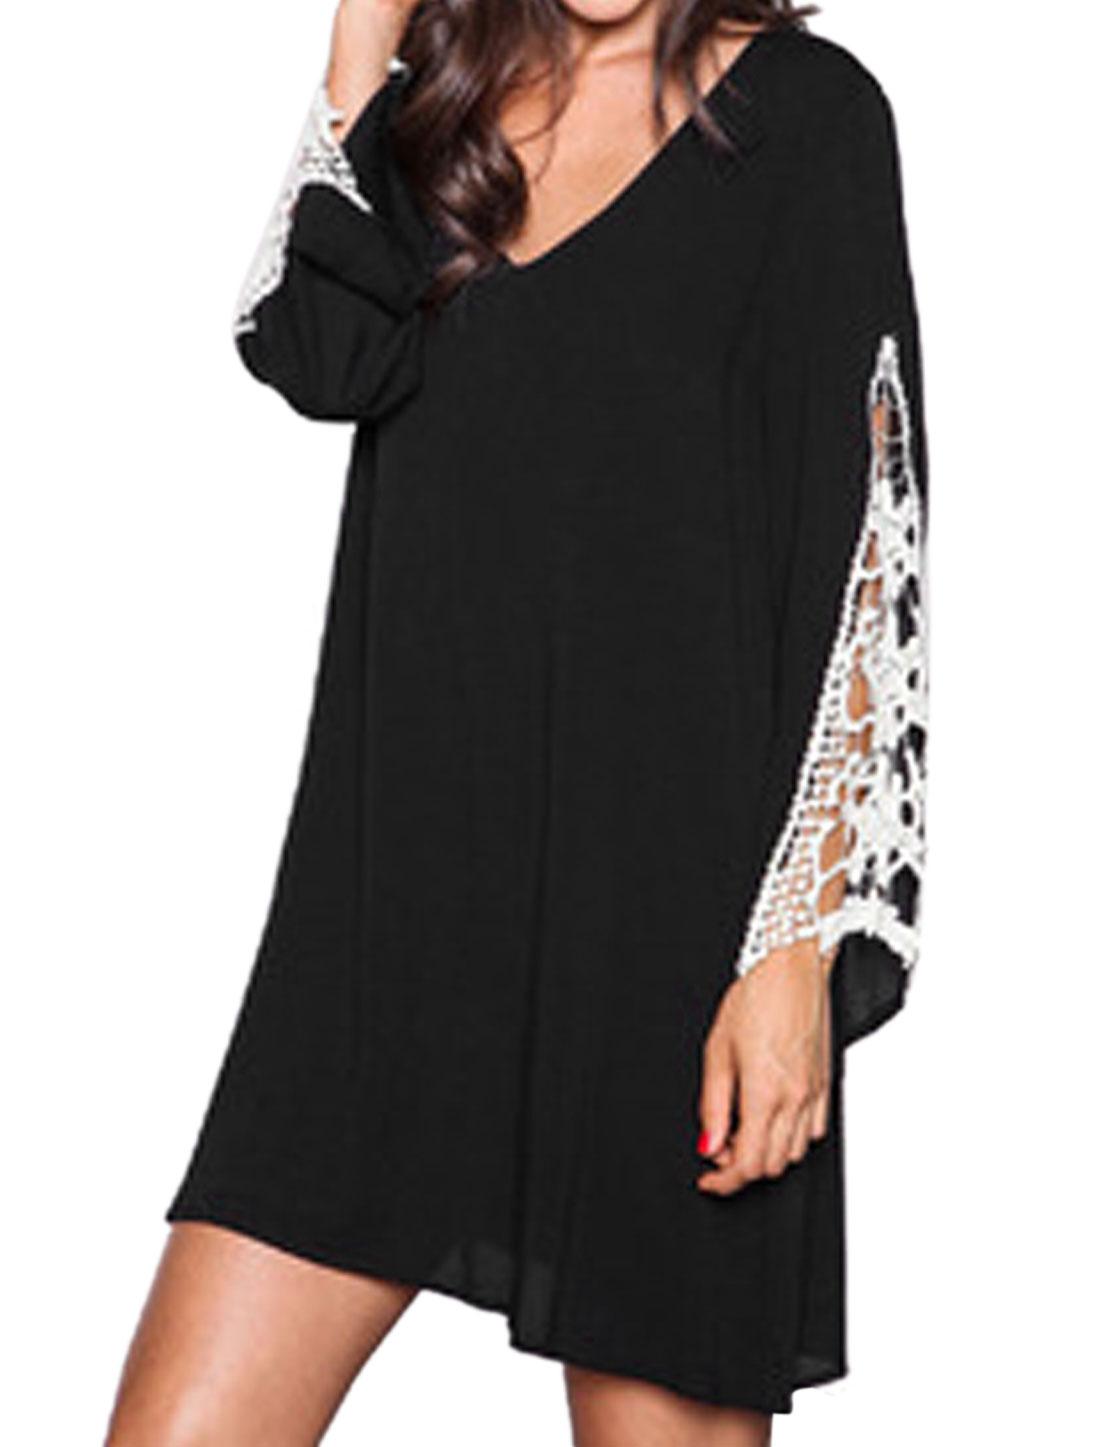 Ladies Crochet Trumpet Sleeves Loose Tunic Dress Black XS